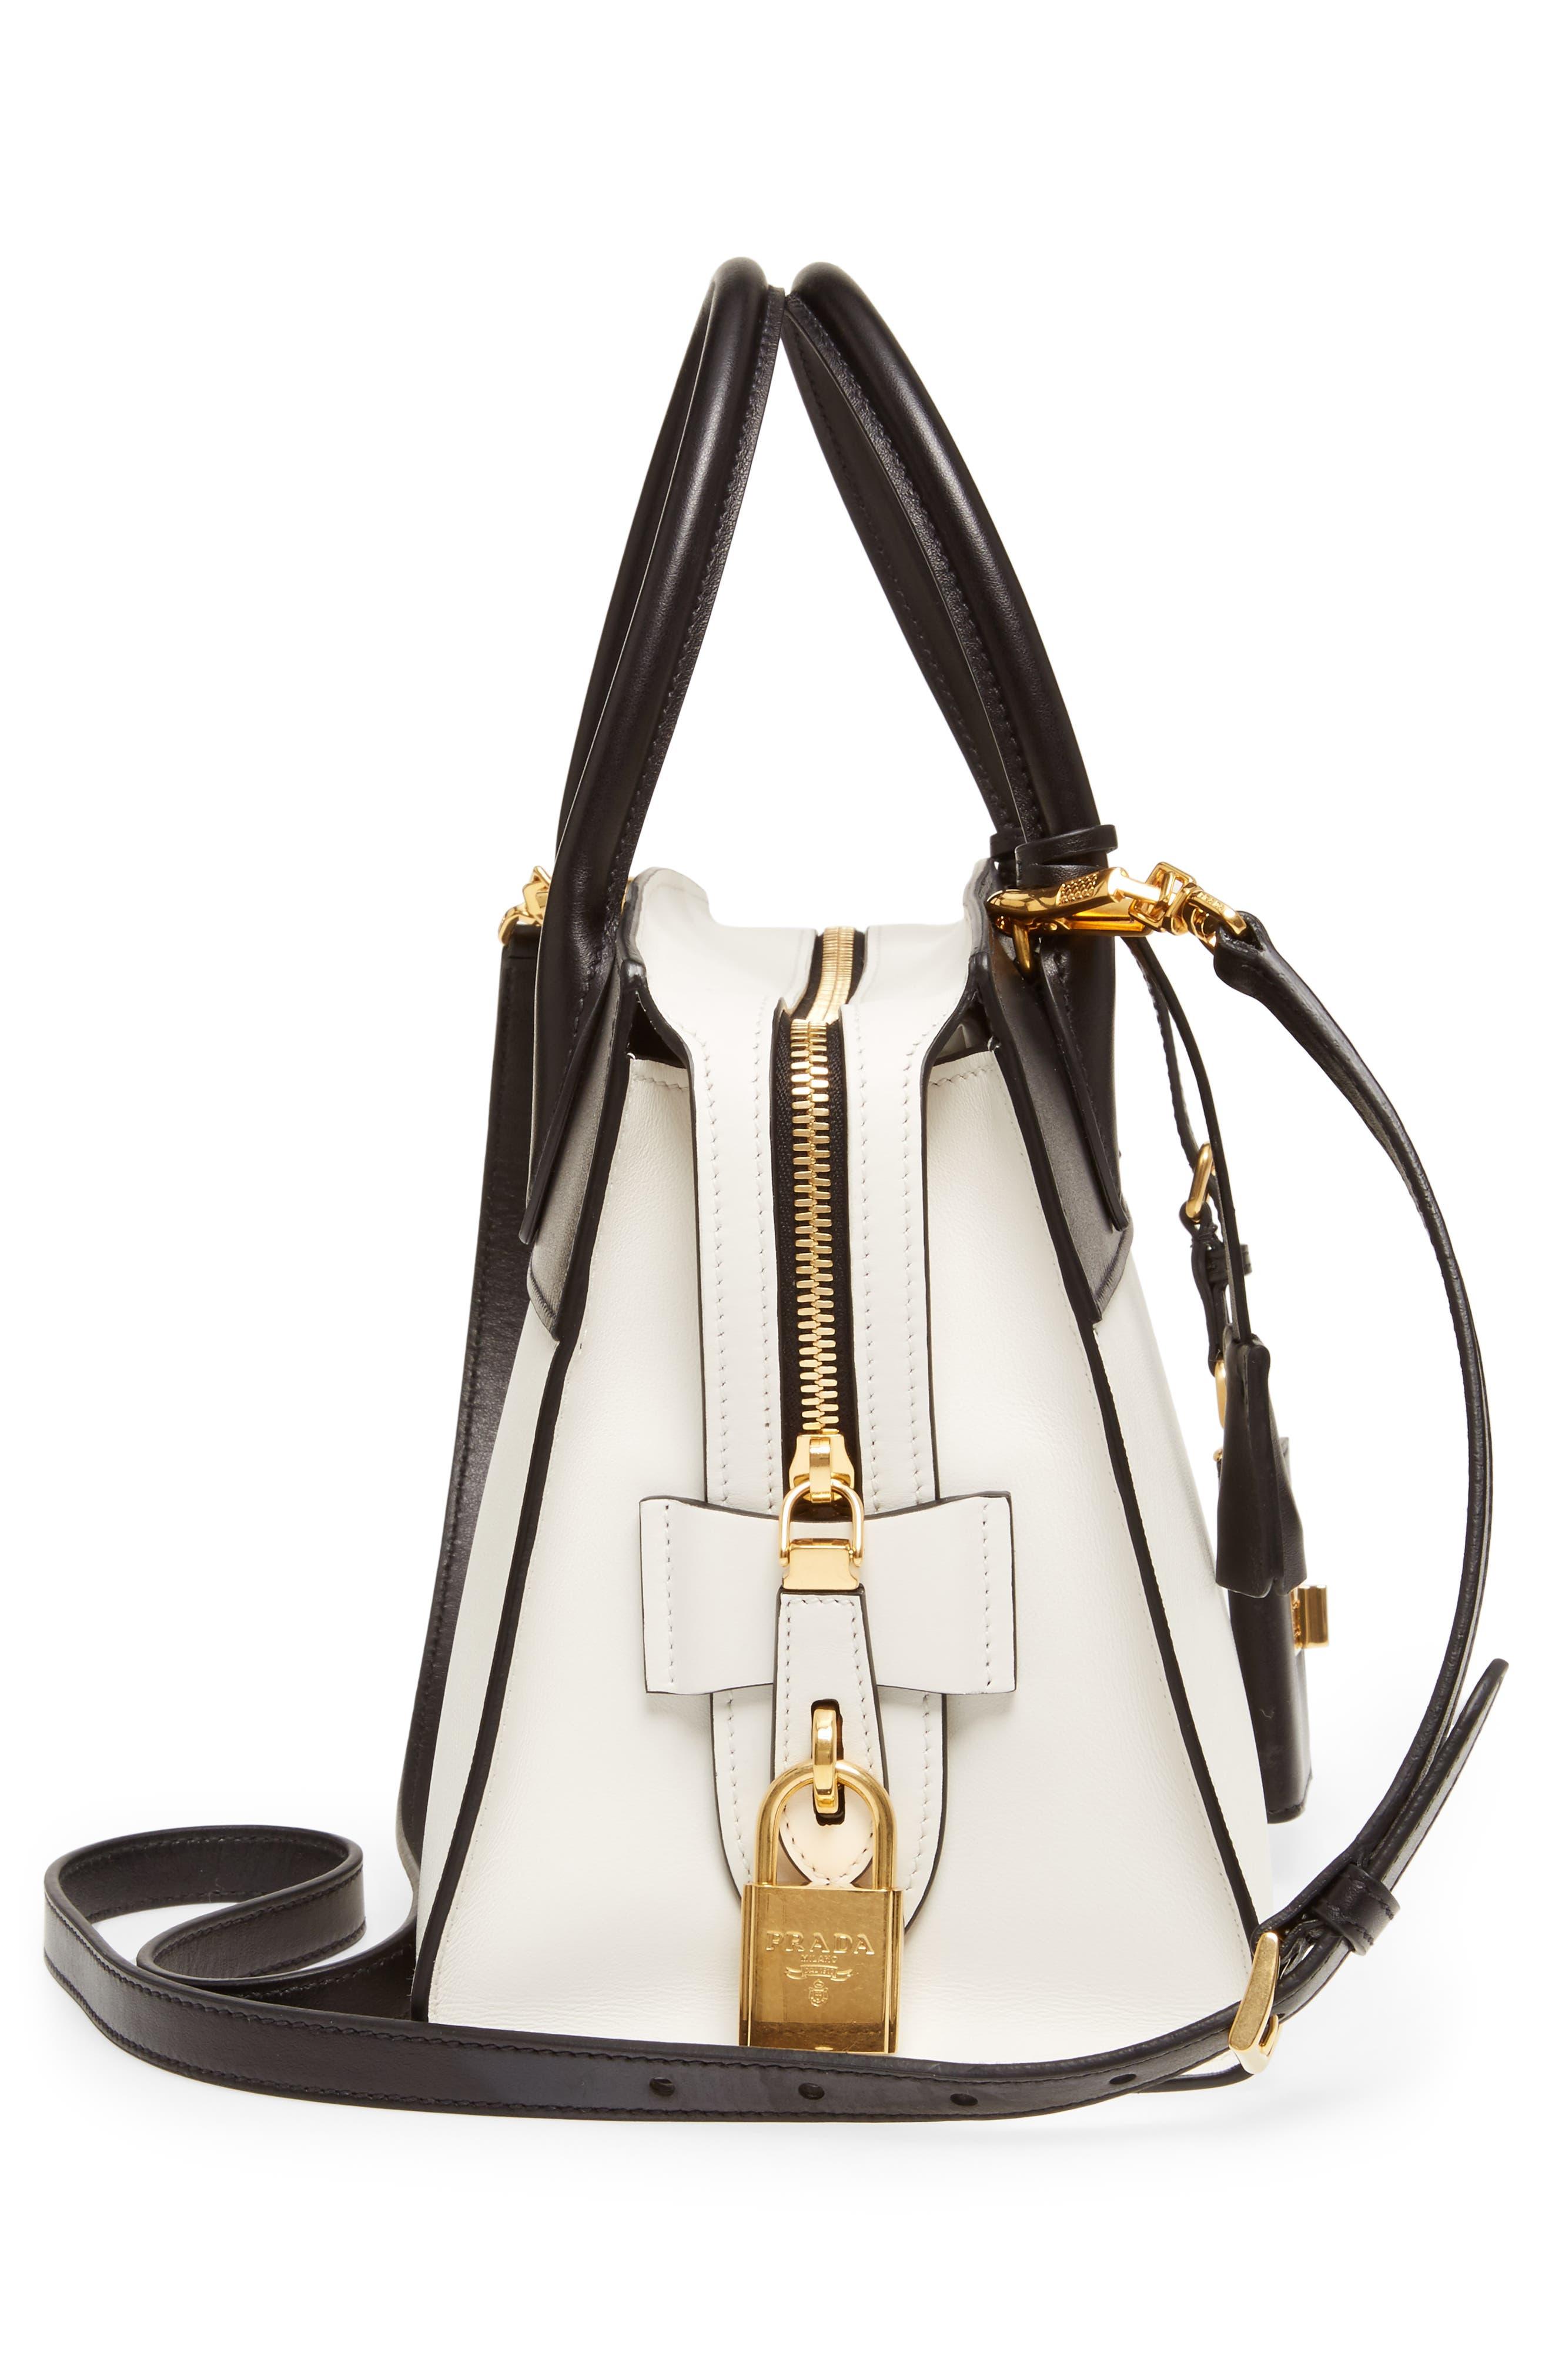 Medium Esplanade Leather Satchel,                             Alternate thumbnail 5, color,                             Bianco/Nero